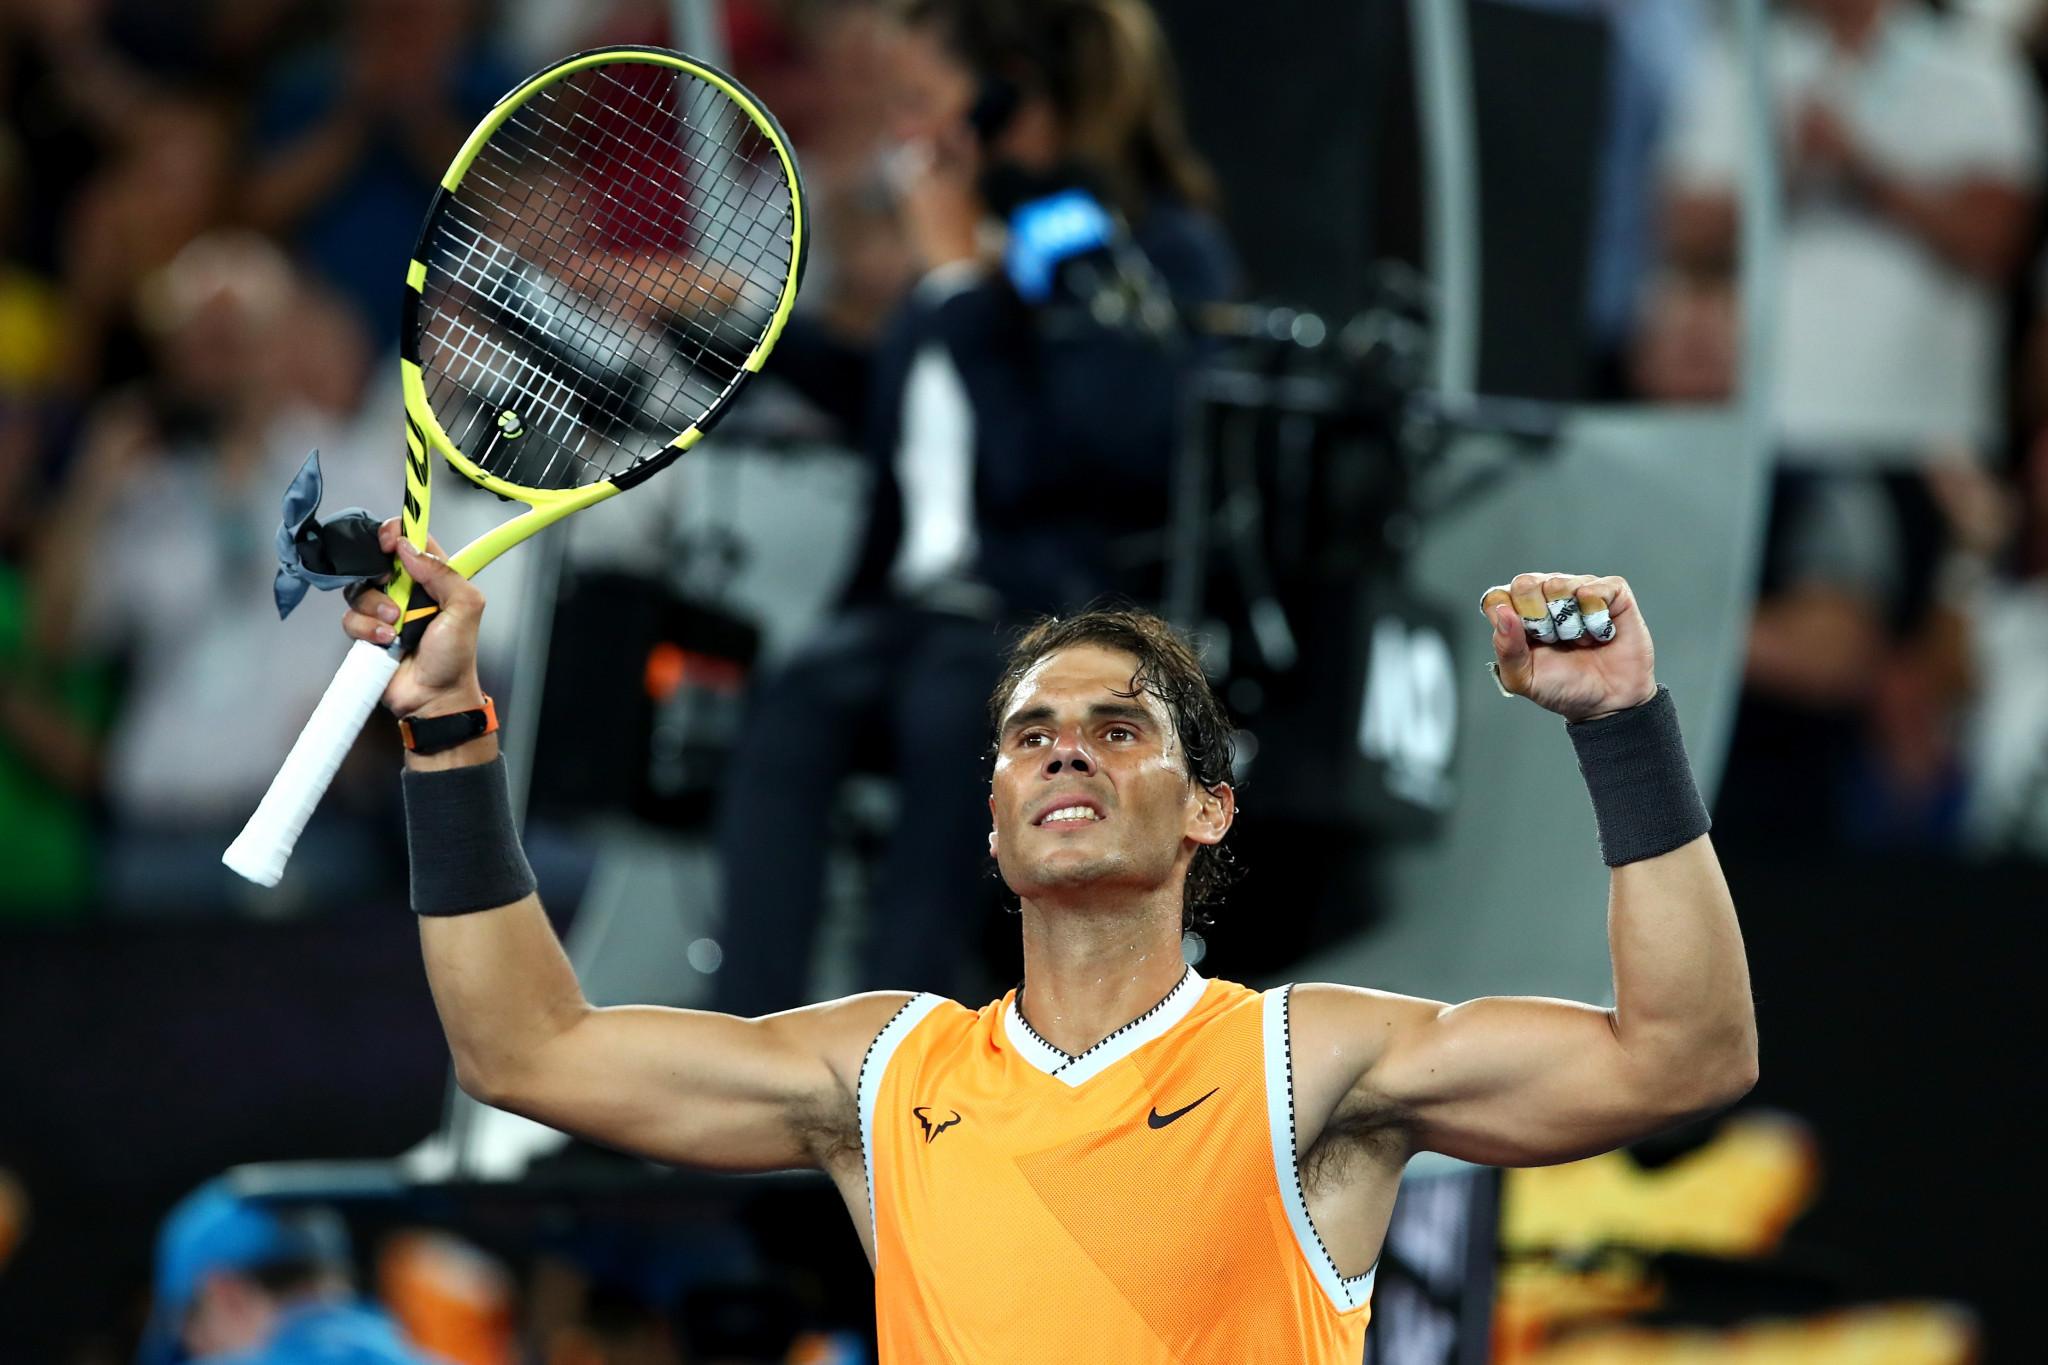 Nadal sets up Tsitsipas semi-final at Australian Open